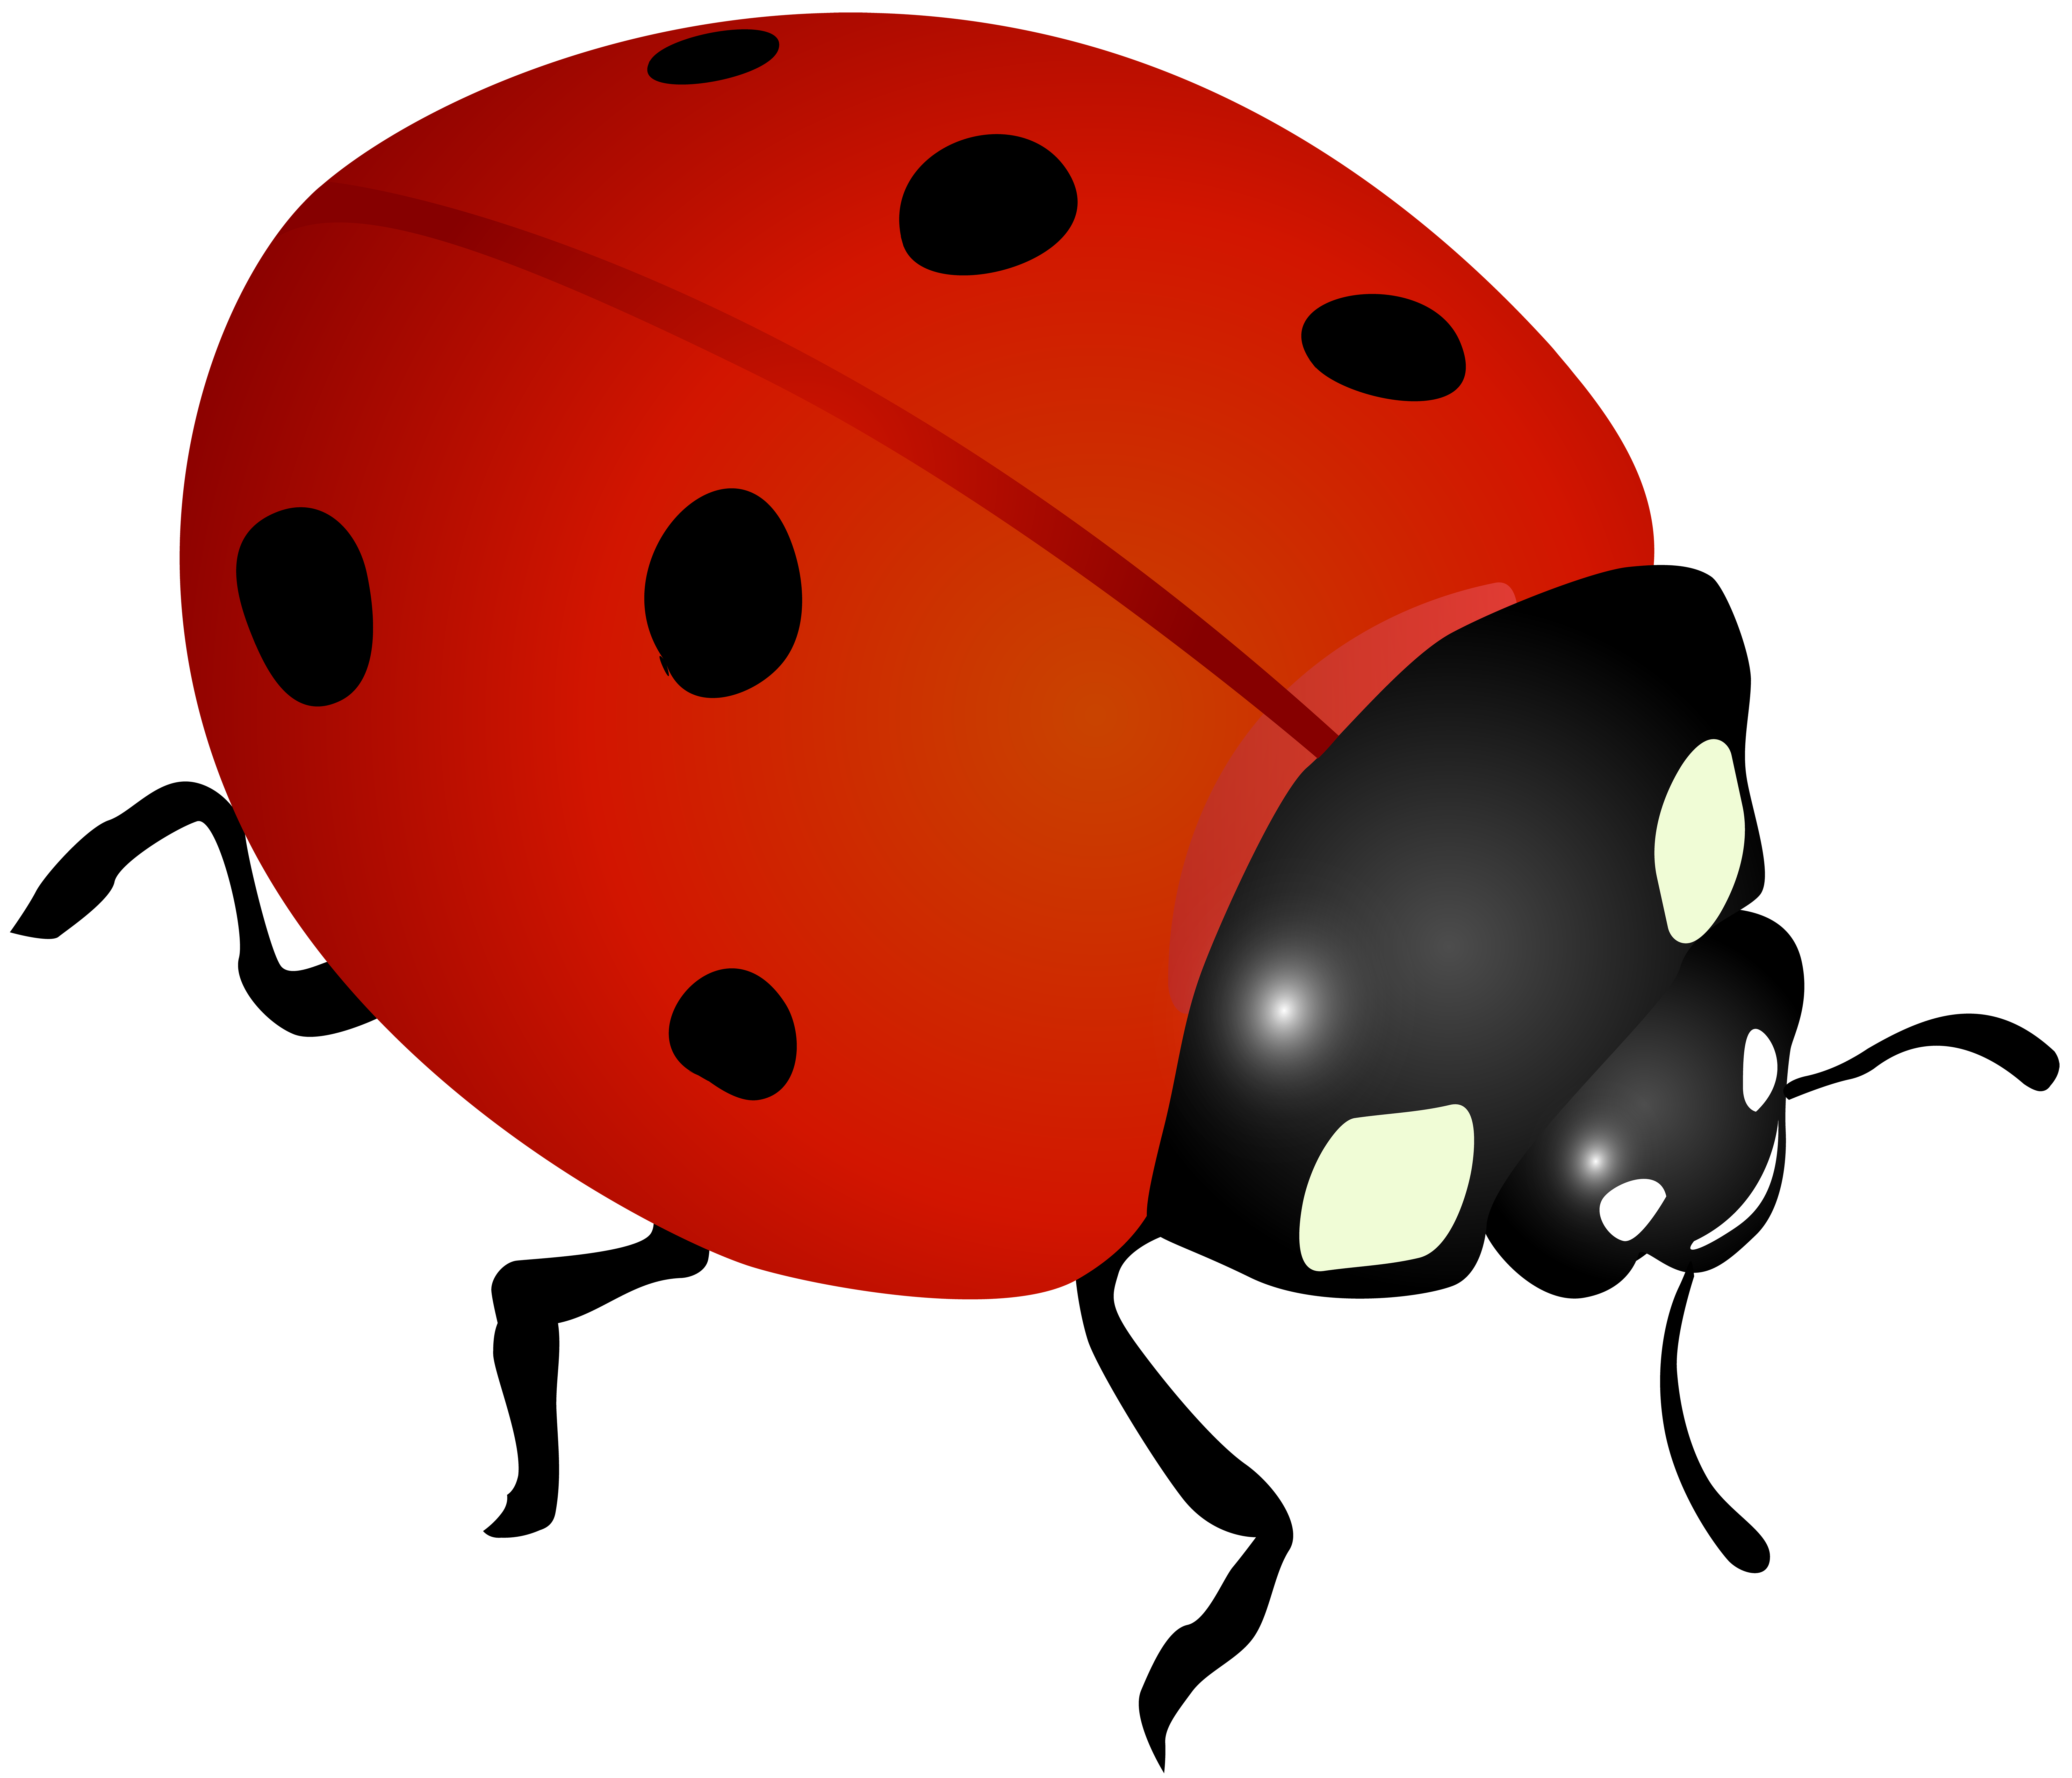 8000x6865 Ladybug Clip Art Imageu200b Gallery Yopriceville